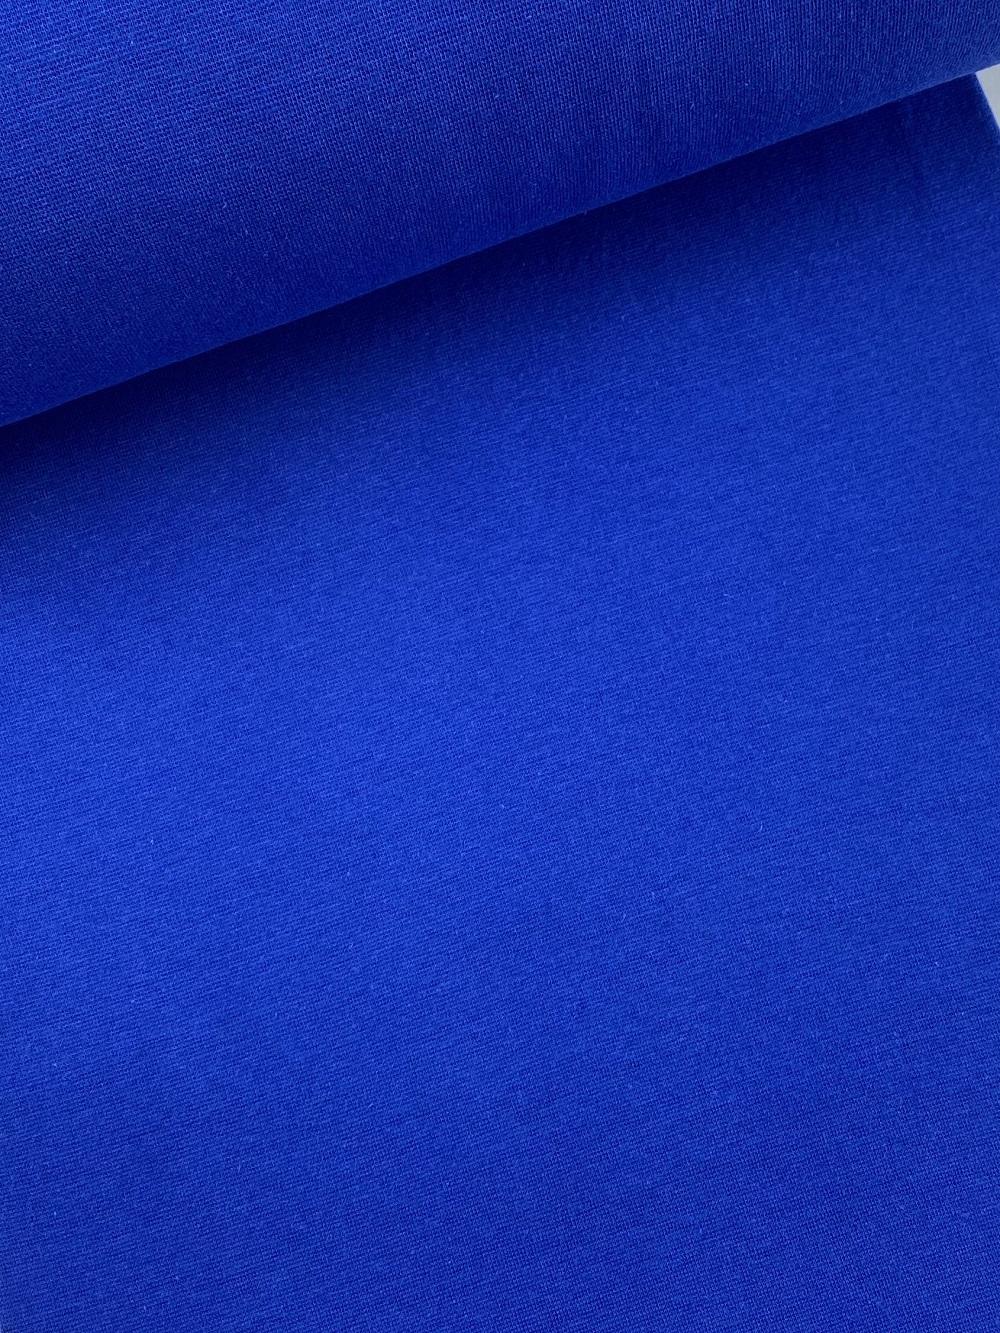 Bündchenware (glatt), königsblau. Art. SW10633